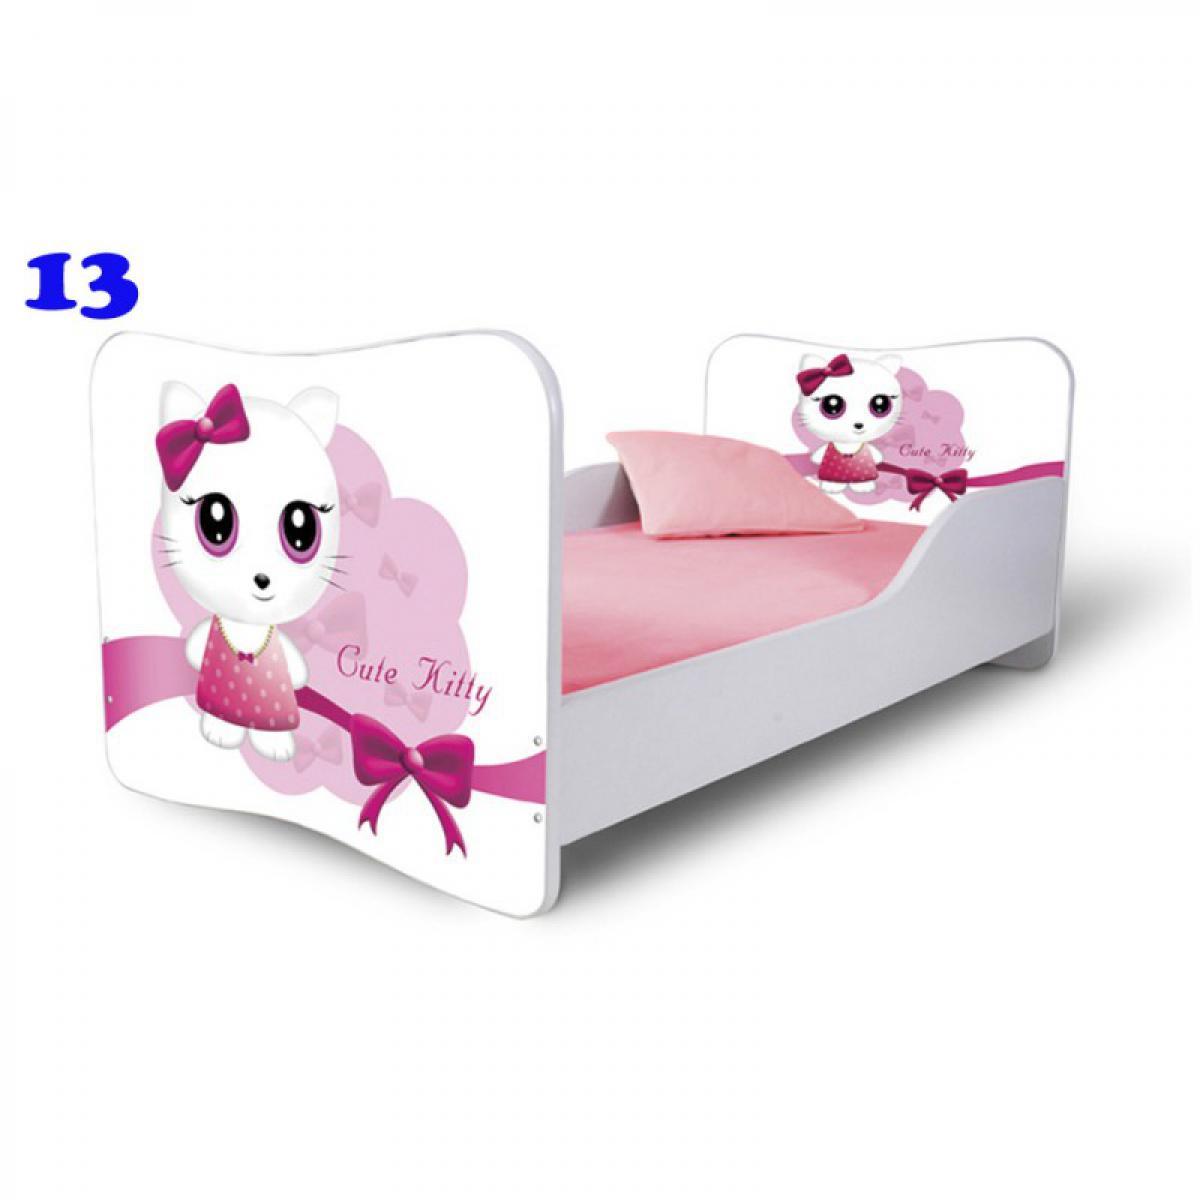 Bim Furniture Lit Enfant 160x80 cm Cute Kitty Blanc avec sommier et matelas